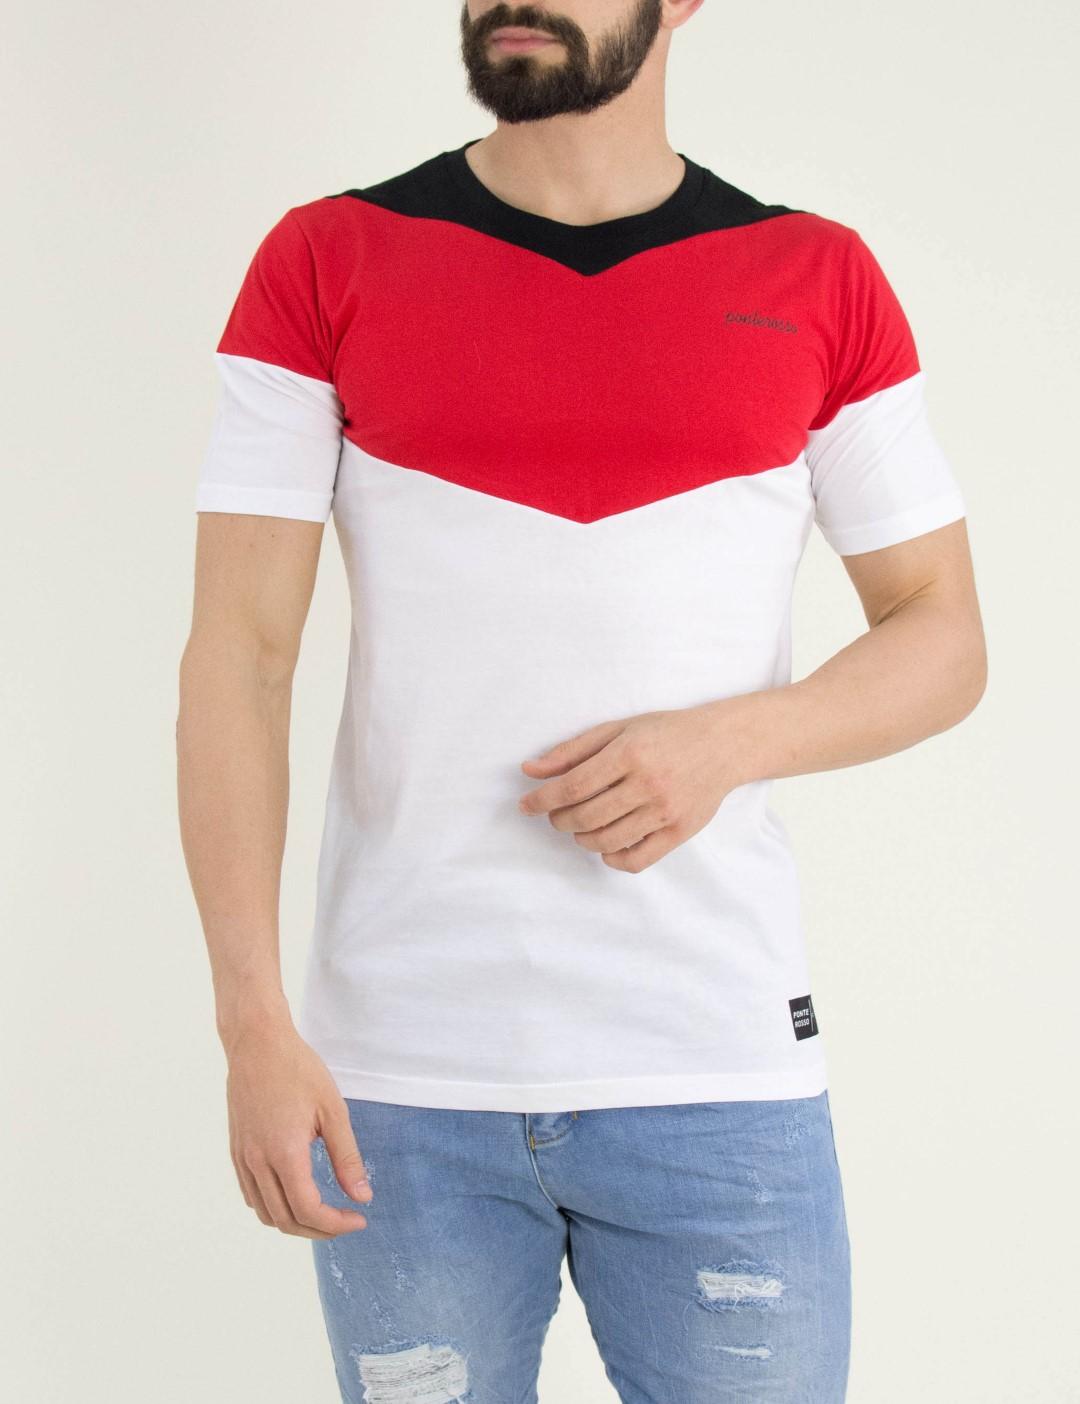 b832e1e3444e Ανδρικό t-shirt · Ανδρικό κόκκινο Tshirt μπλουζάκι τριχρωμία 191030